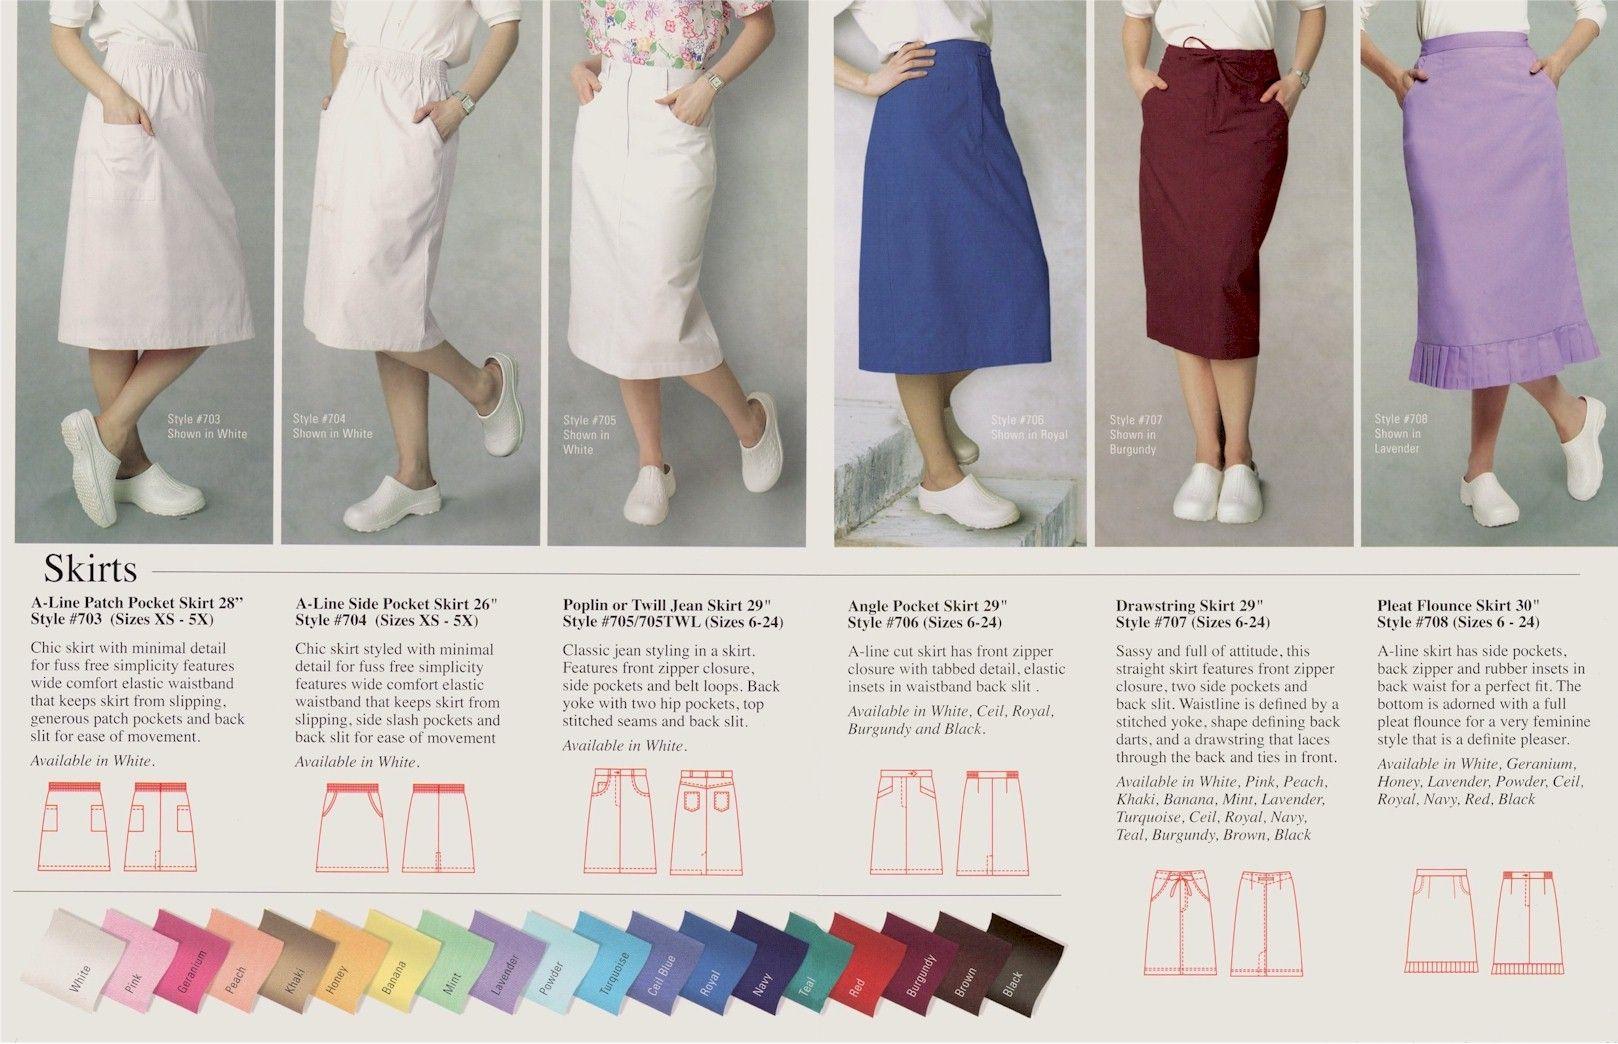 06828de3ffc Assorted skirts, medical uniforms, Medical scrubs, Wholesale, Distributor